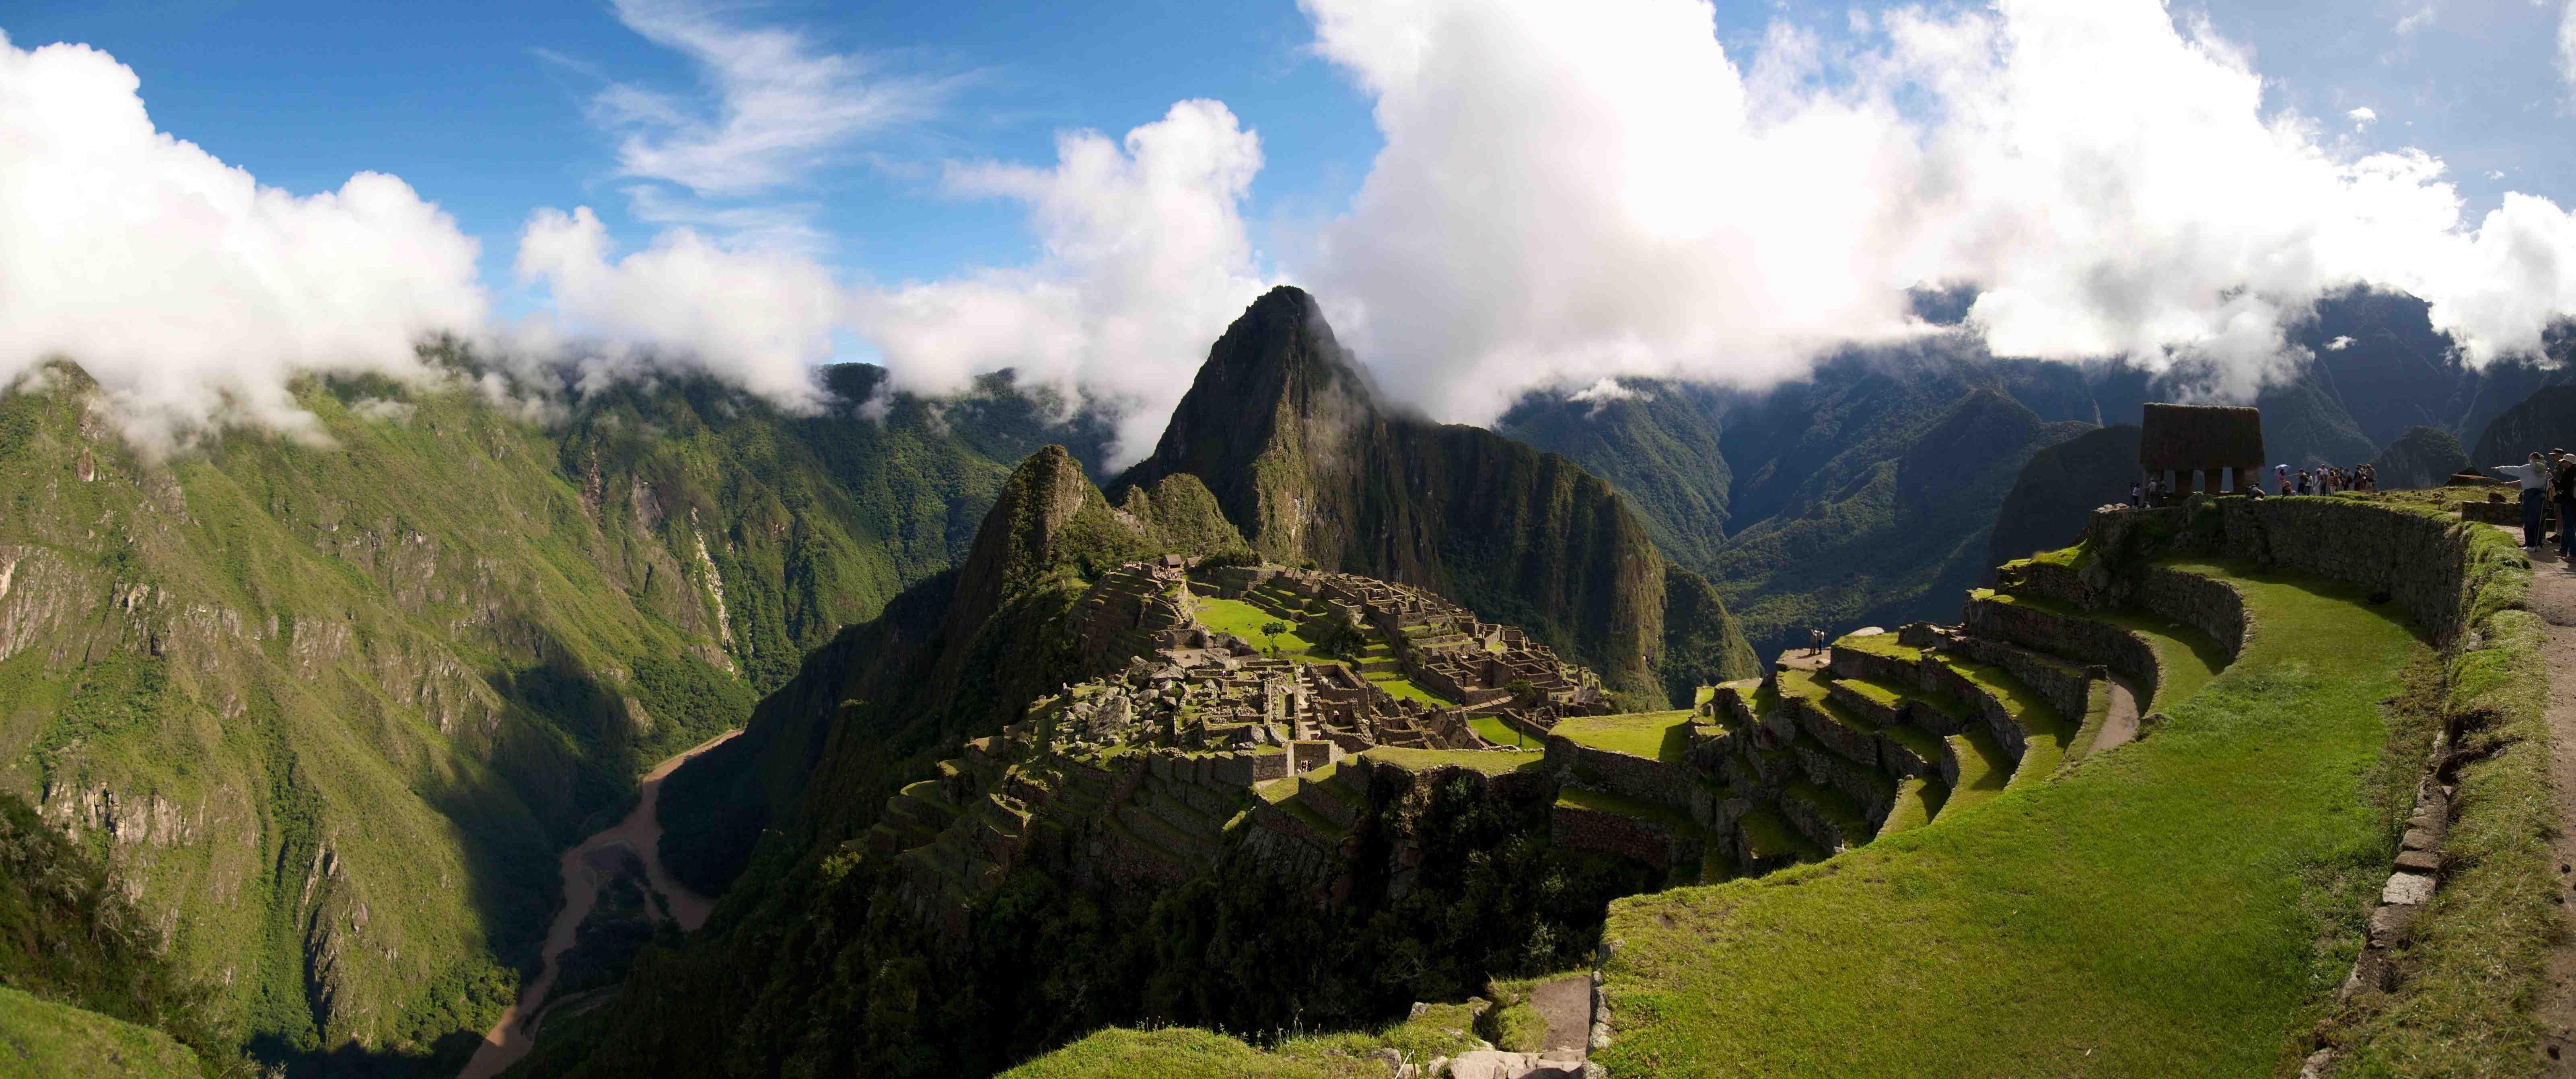 Machu Picchu - Photo by Pat Pomerleau